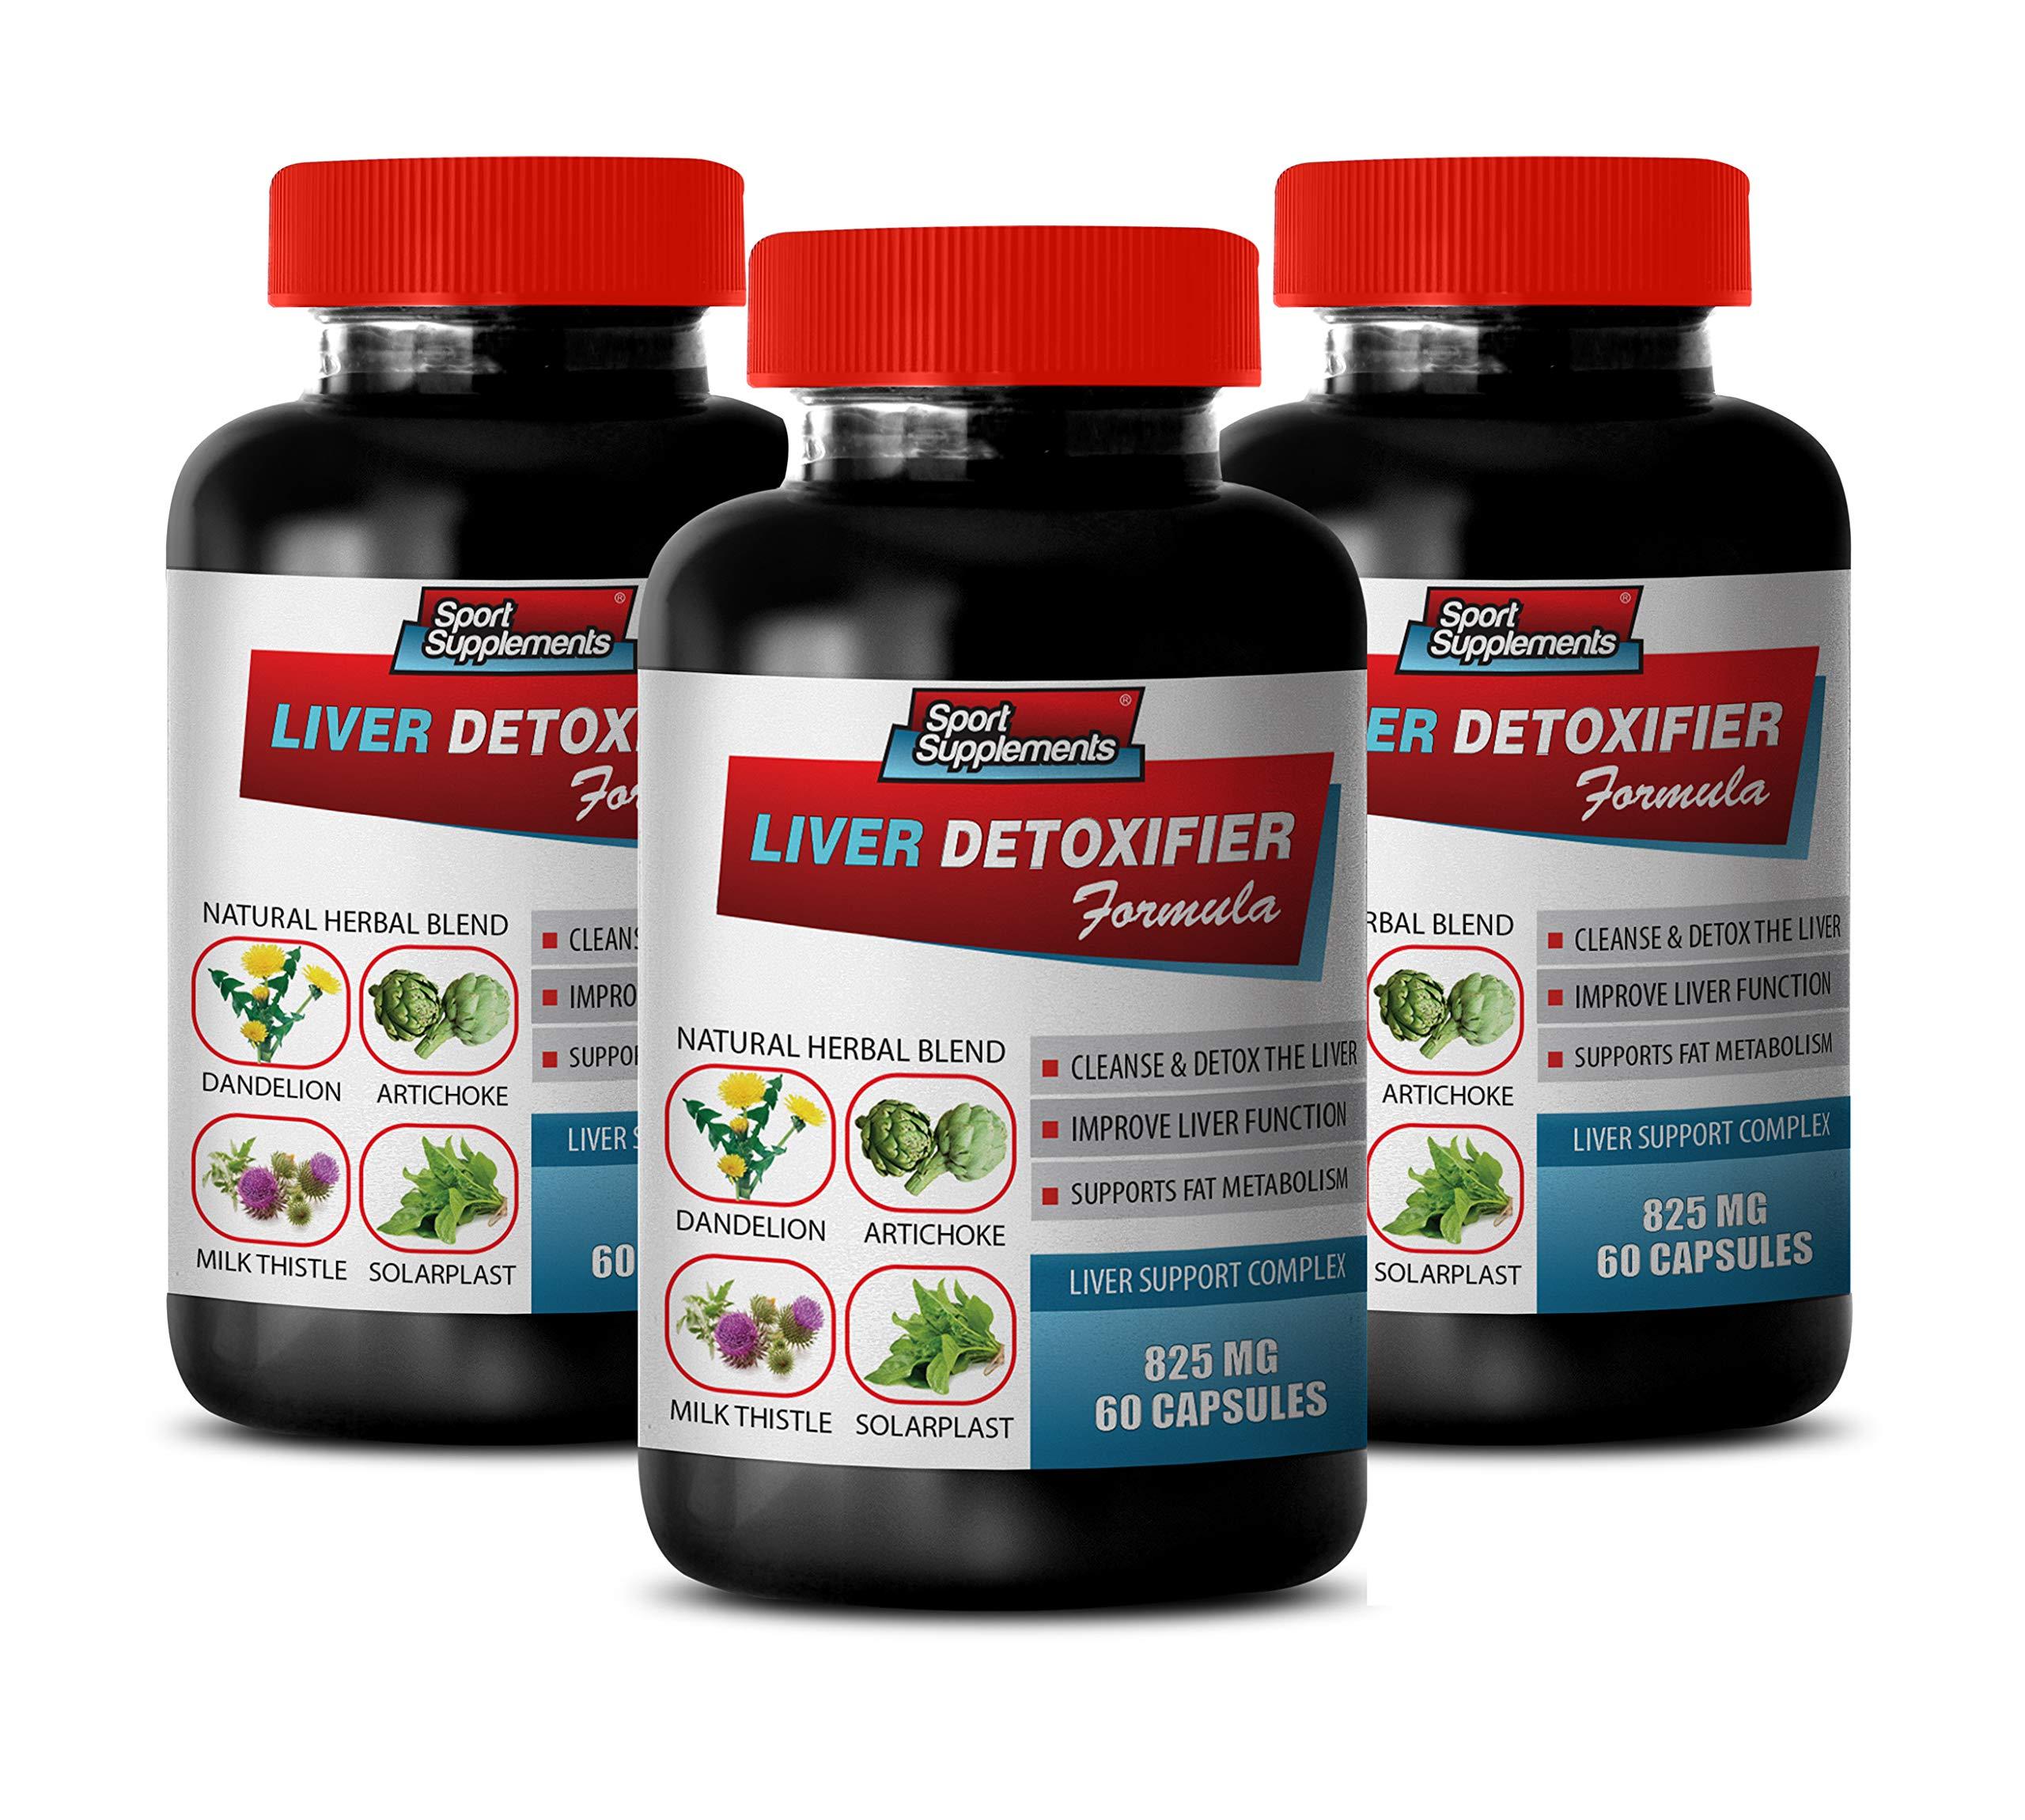 Liver Cleanse and Support - Liver DETOXIFIER Formula - Natural Herbal Blend - protease Supplement - 3 Bottles 180 Capsules